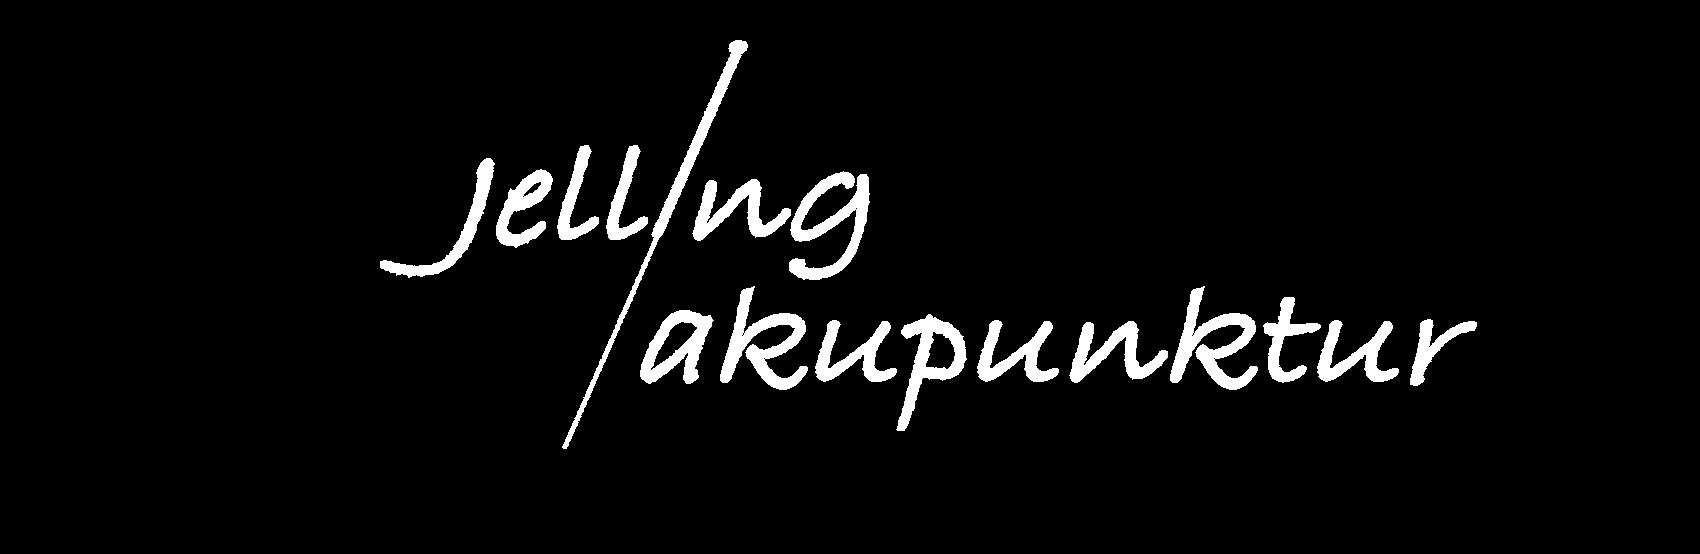 Jelling Akupunktur